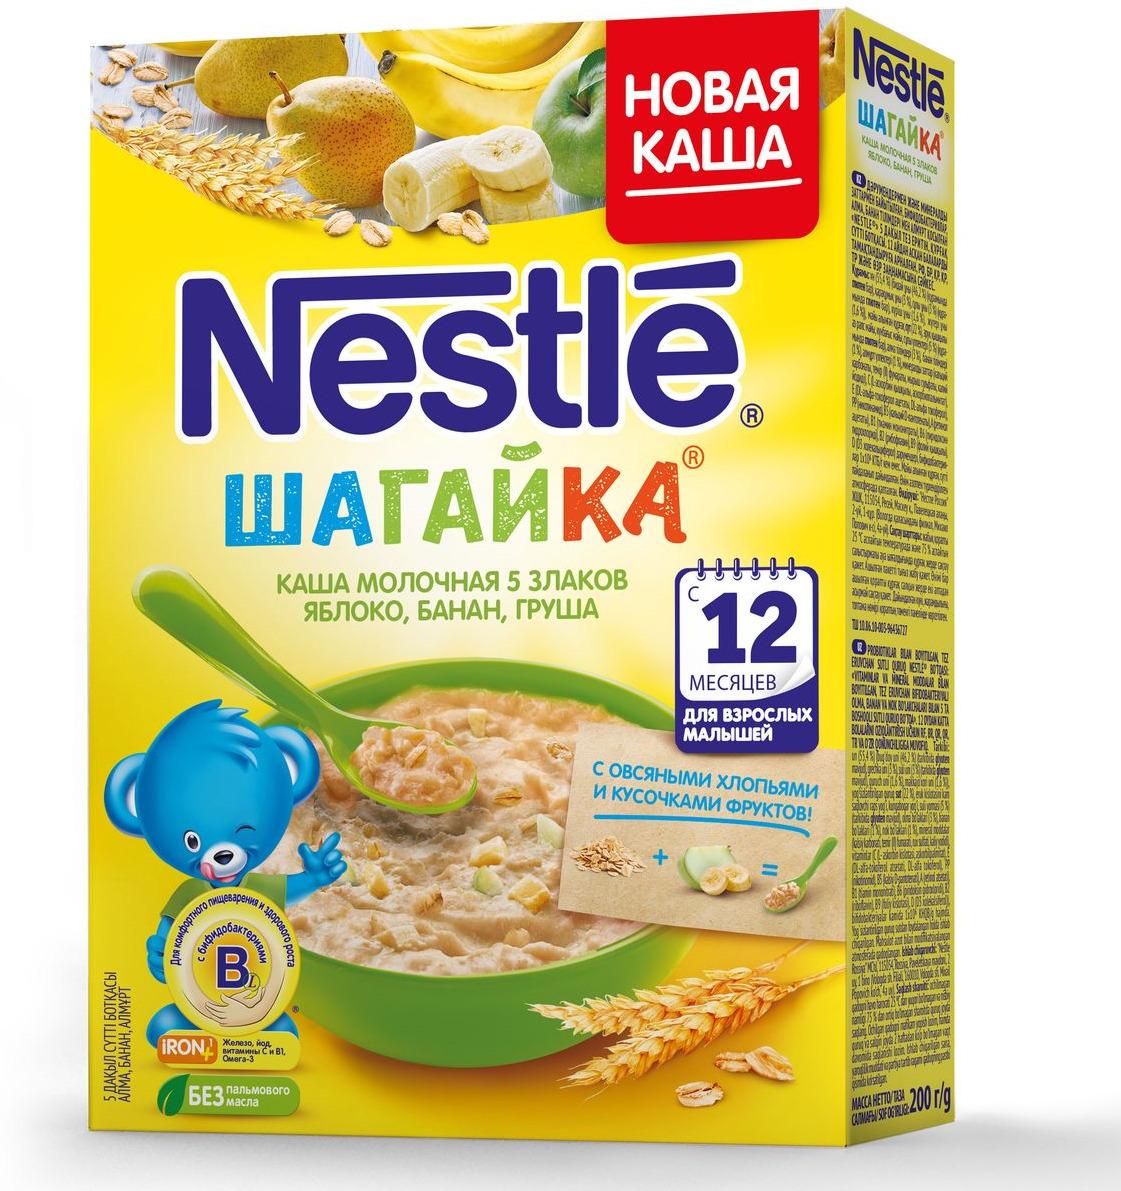 Nestle 5 злаков яблоко банан груша каша молочная, 200 г